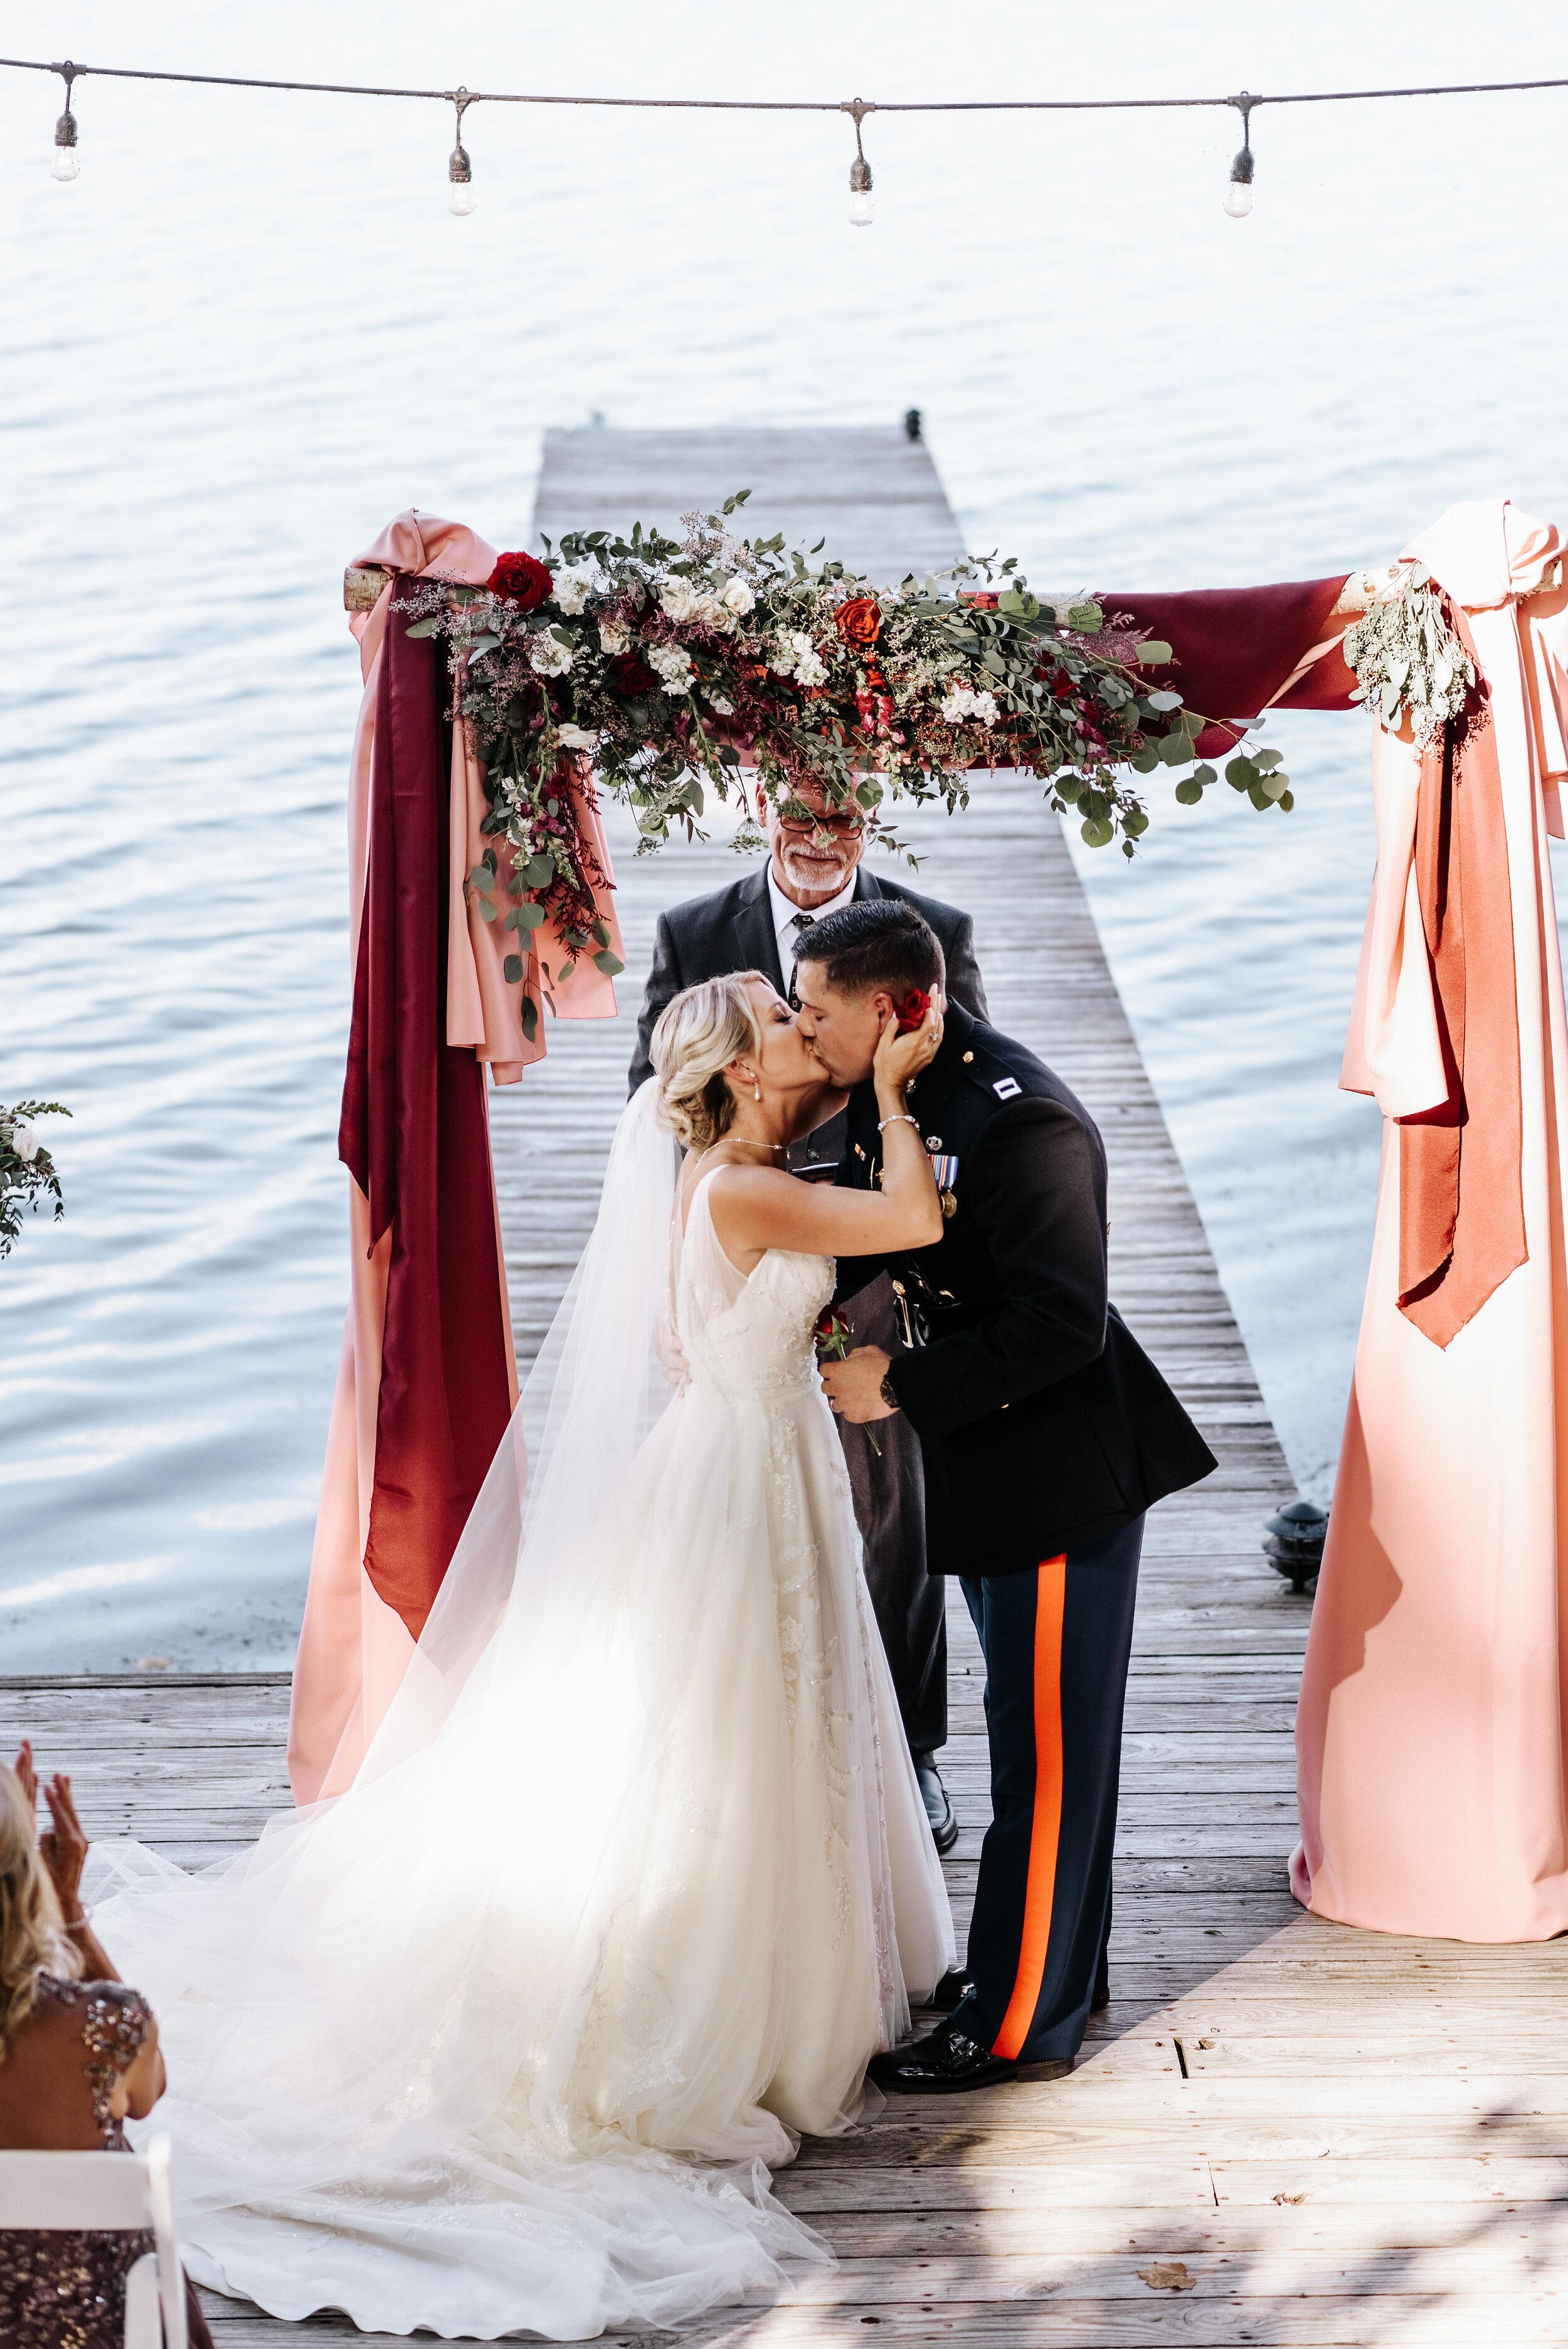 Emily_Mike_Wedding_Celebrations_at_the_Reservoir_Pool_Pavilion_Richmond_Virginia_Wedding_Photographer_Photography_by_V_52.jpg